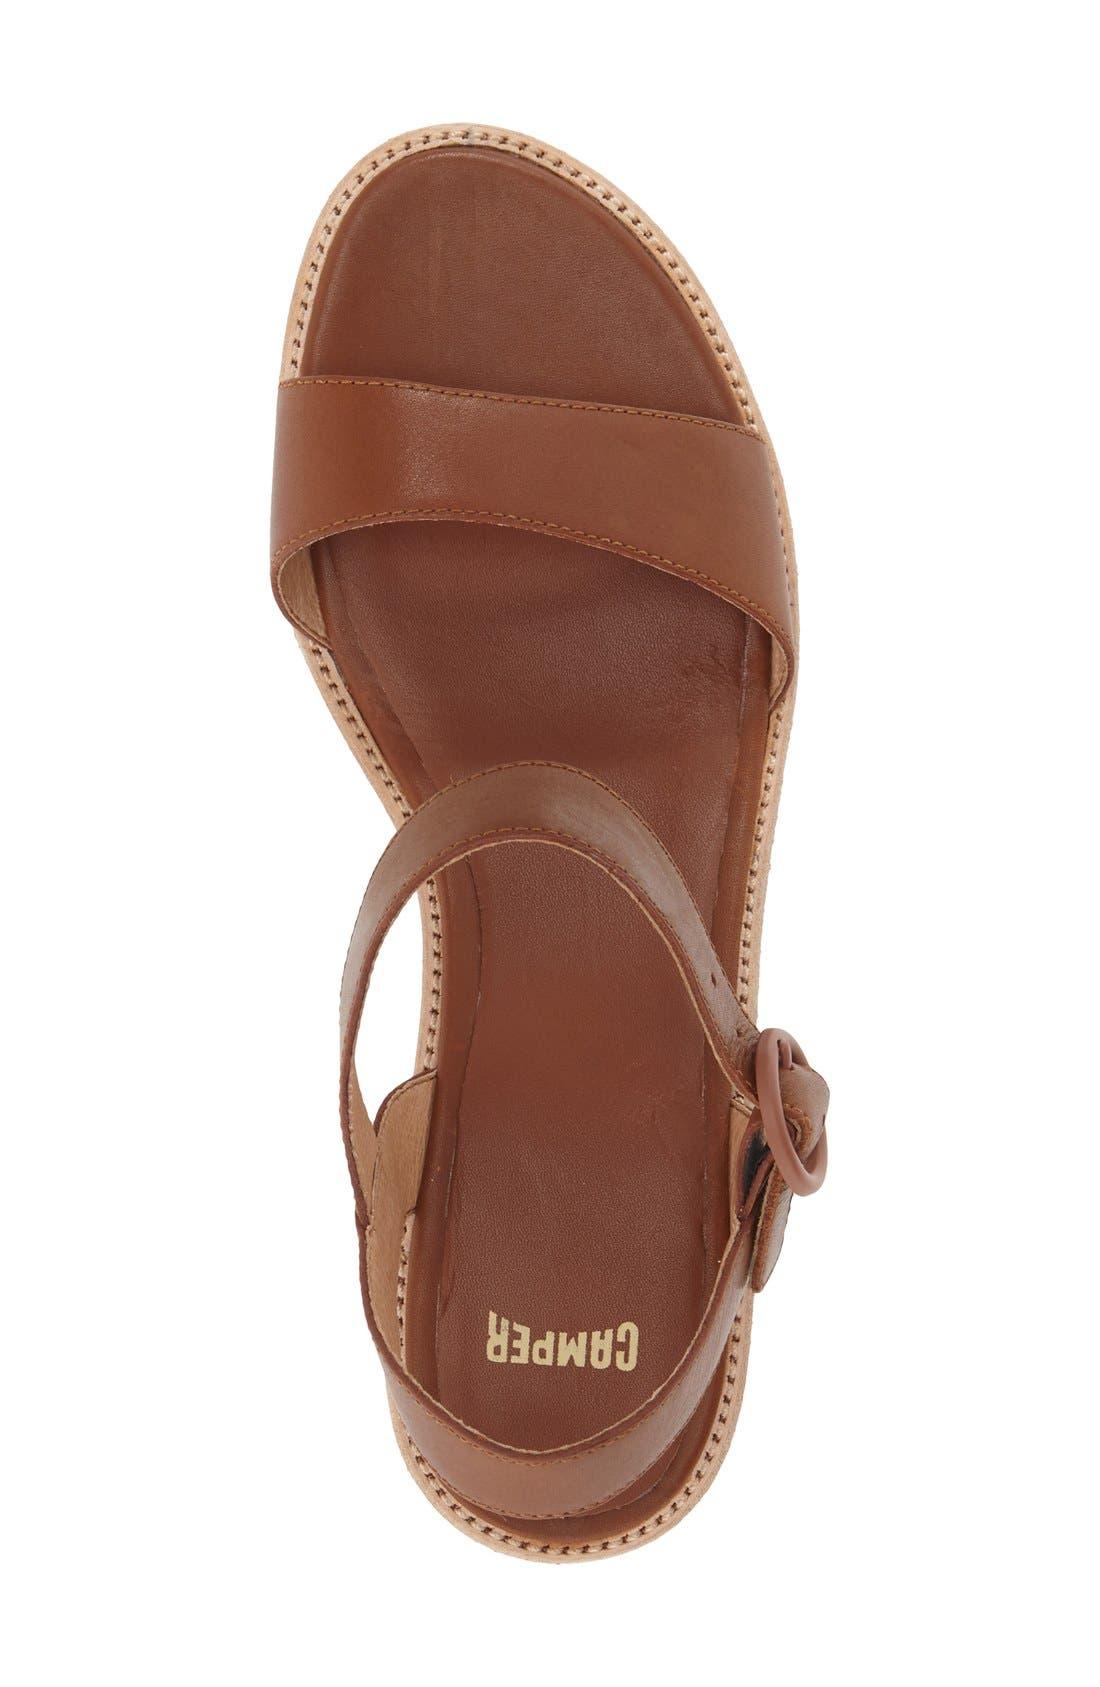 'Damas' Wedge Sandal,                             Alternate thumbnail 31, color,